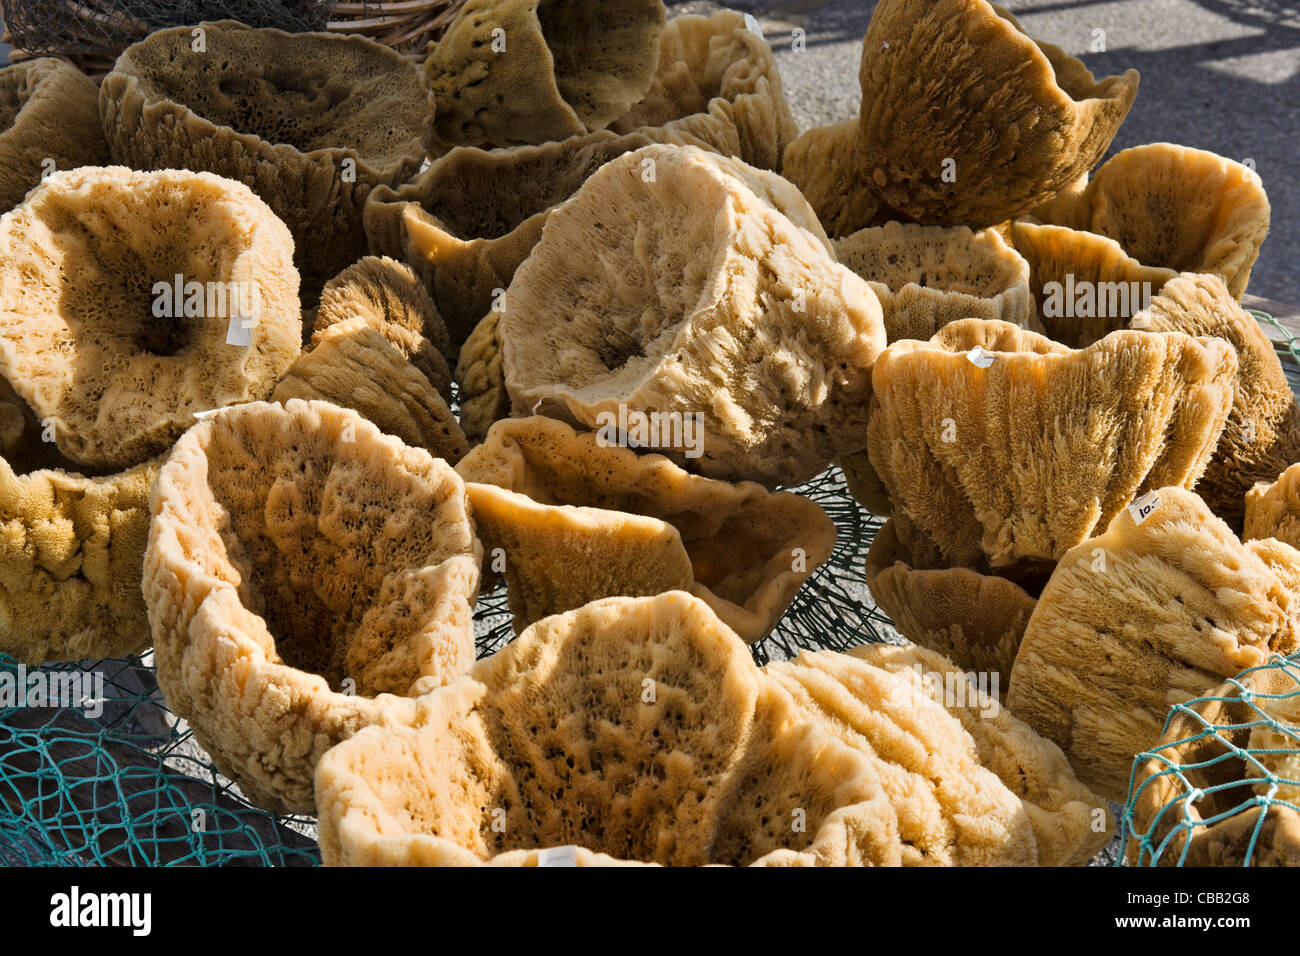 Natural sponges for sale on the Sponge Docks, Tarpon Springs, Gulf Coast, Florida, USA - Stock Image